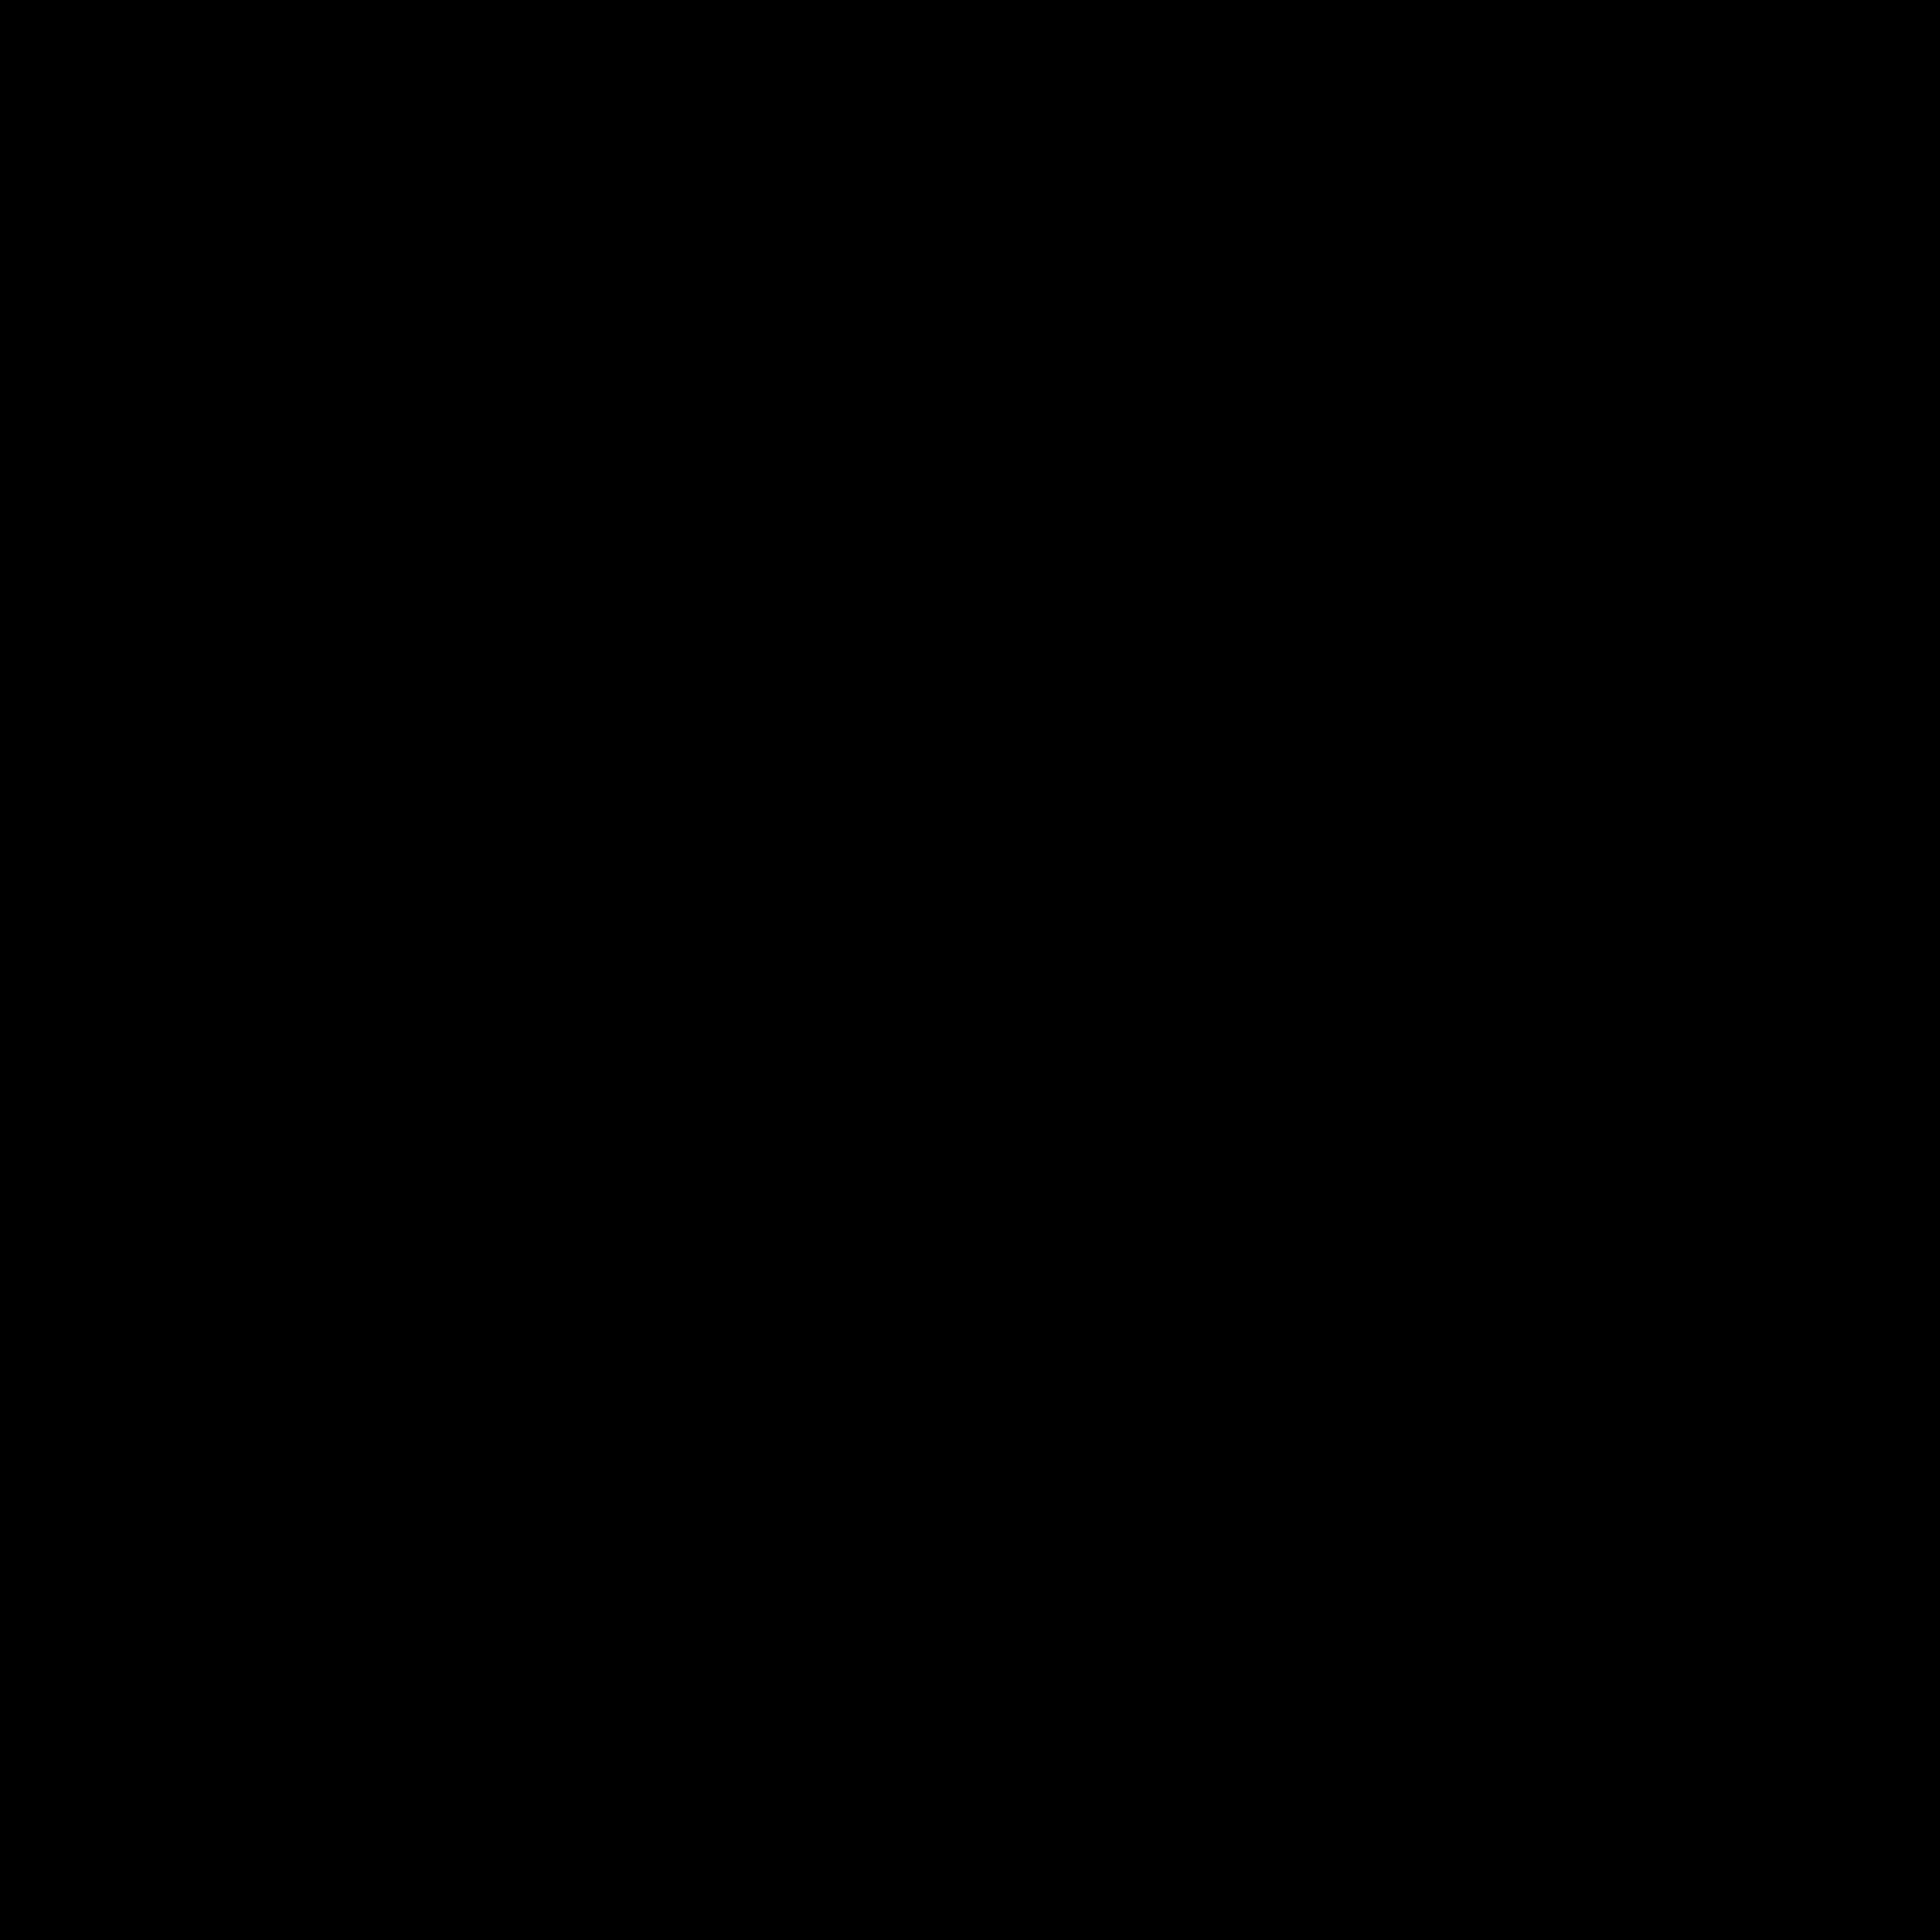 9DFDDE8B-E39D-438D-A3E2-ED7FA2716F73.png